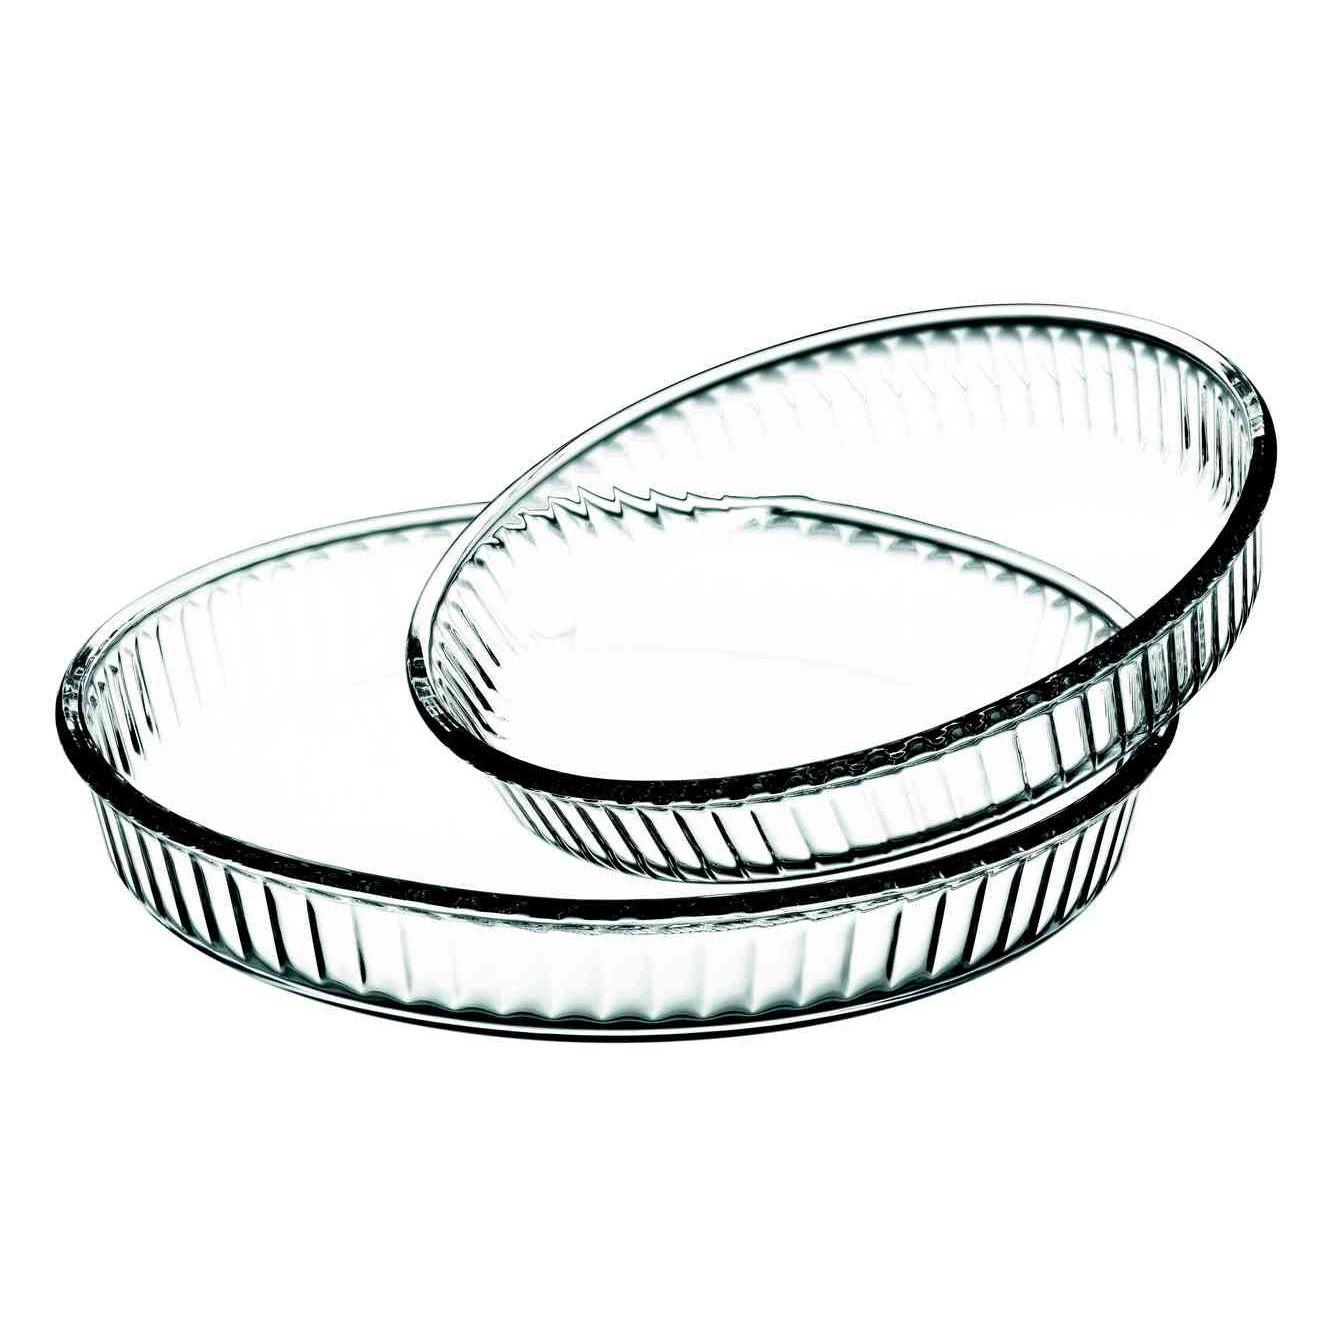 Набор форм д/запекания 2прНабор посуды для СВЧ 2 пр (круглые формы для запекания d 320 мм + d 260 мм) 2,6 л+1,6 л<br>